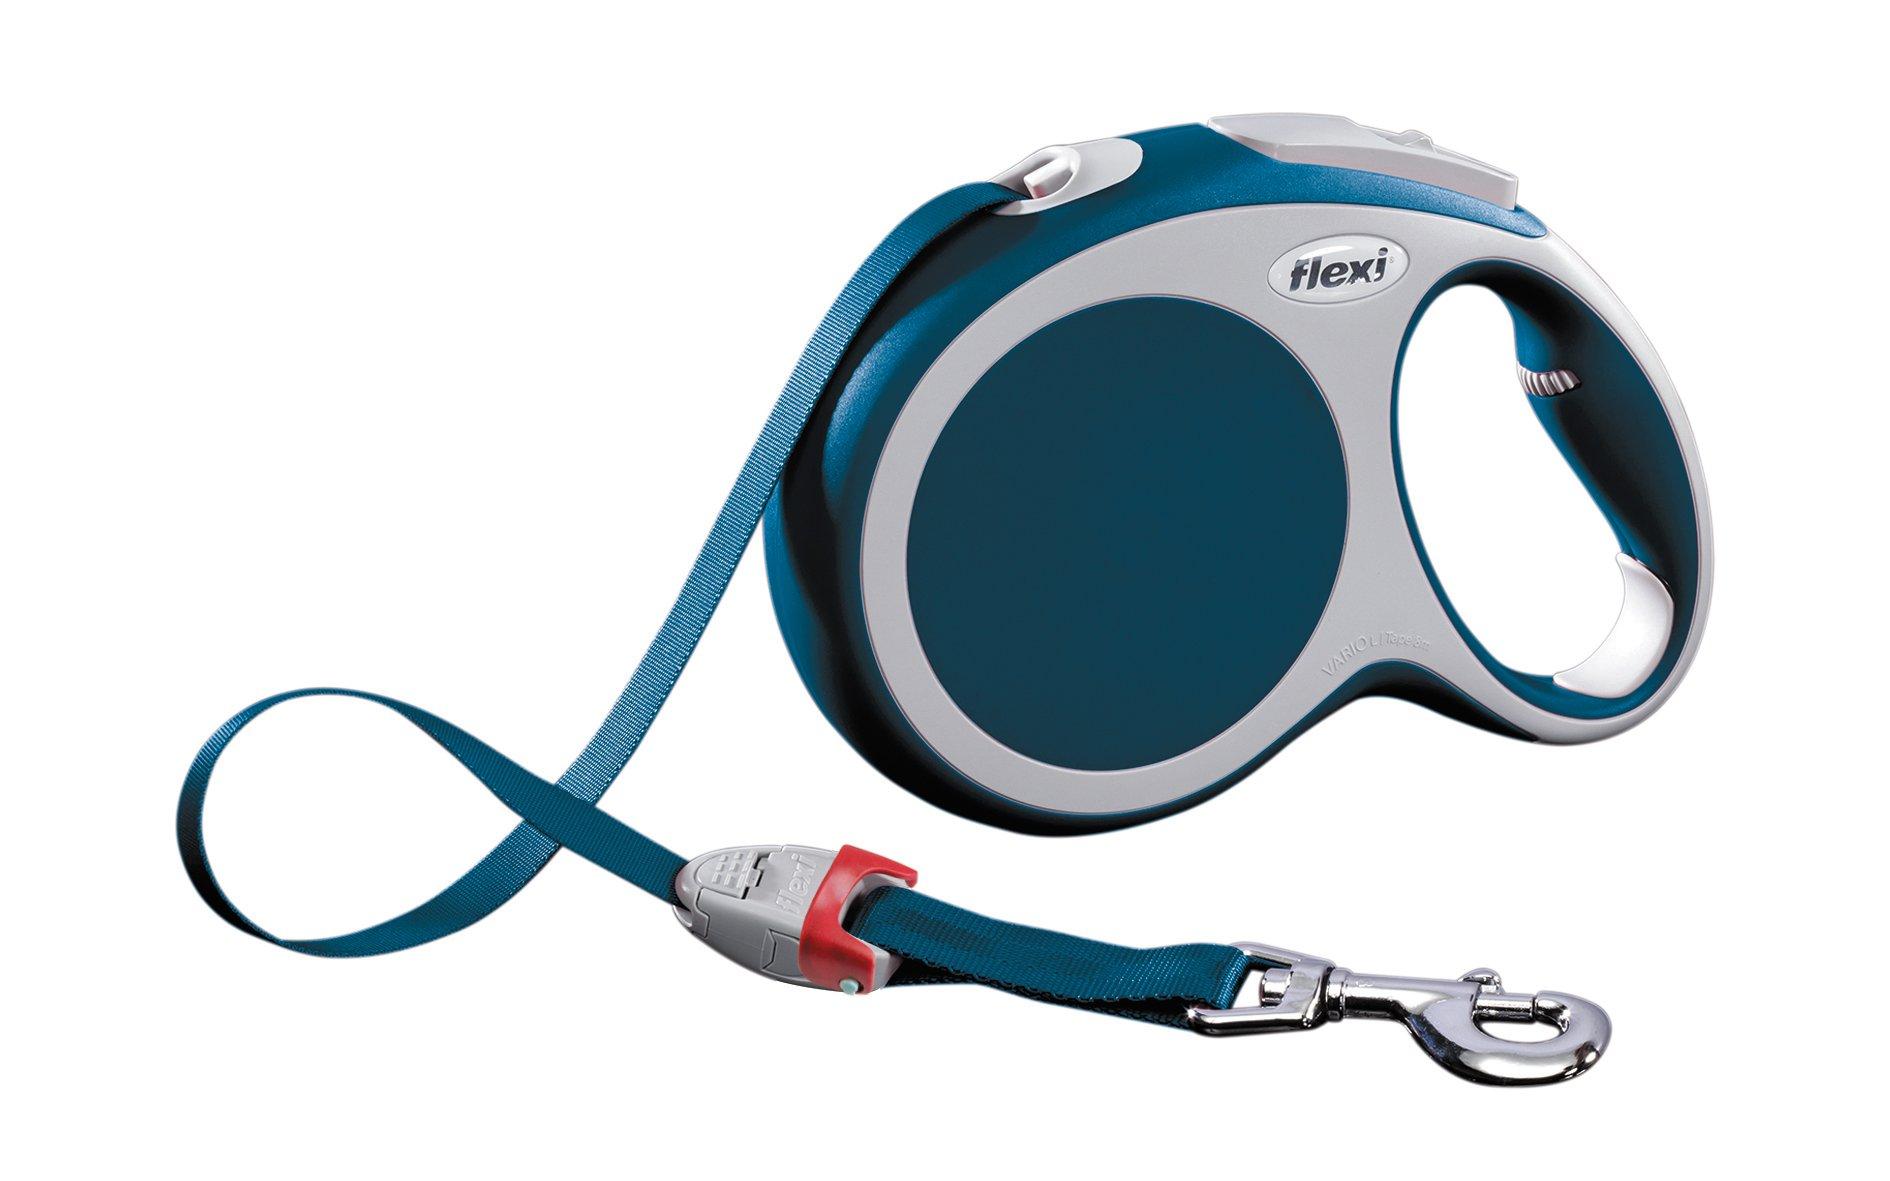 Flexi Vario Retractable Lead Tape, Blue, Large, 8 m